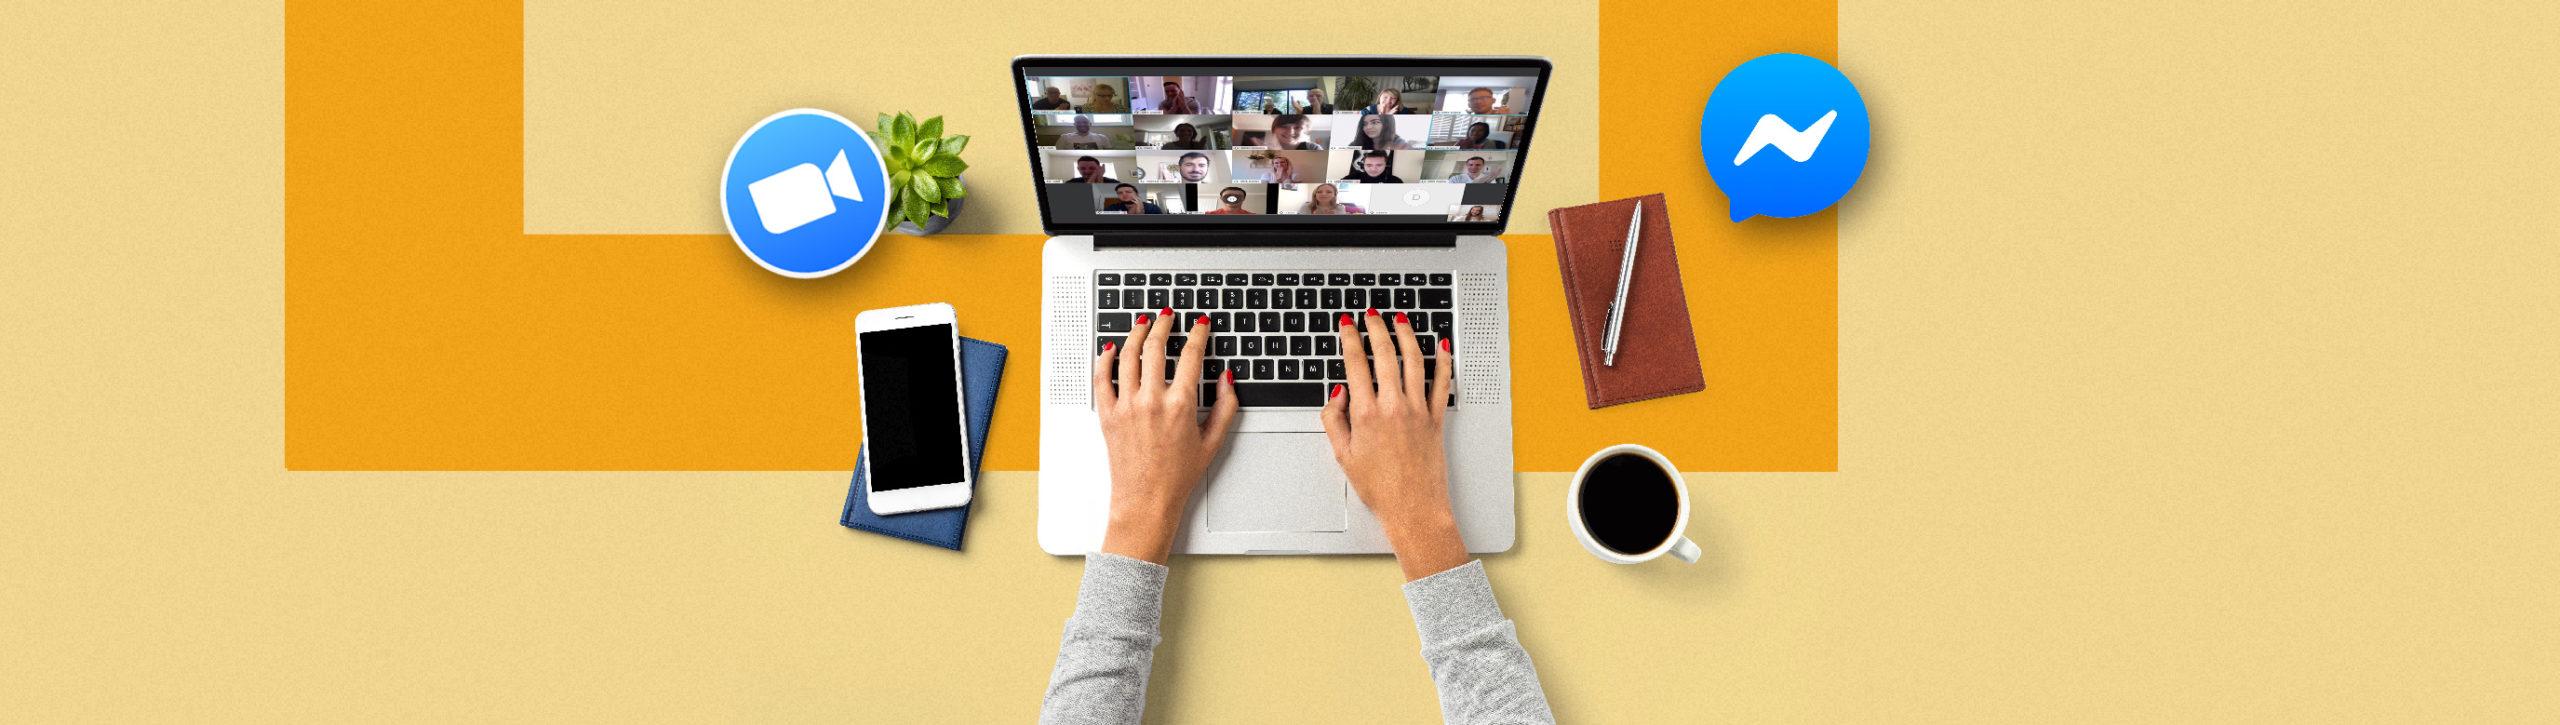 How Social Media Platforms Have Evolved During COVID-19